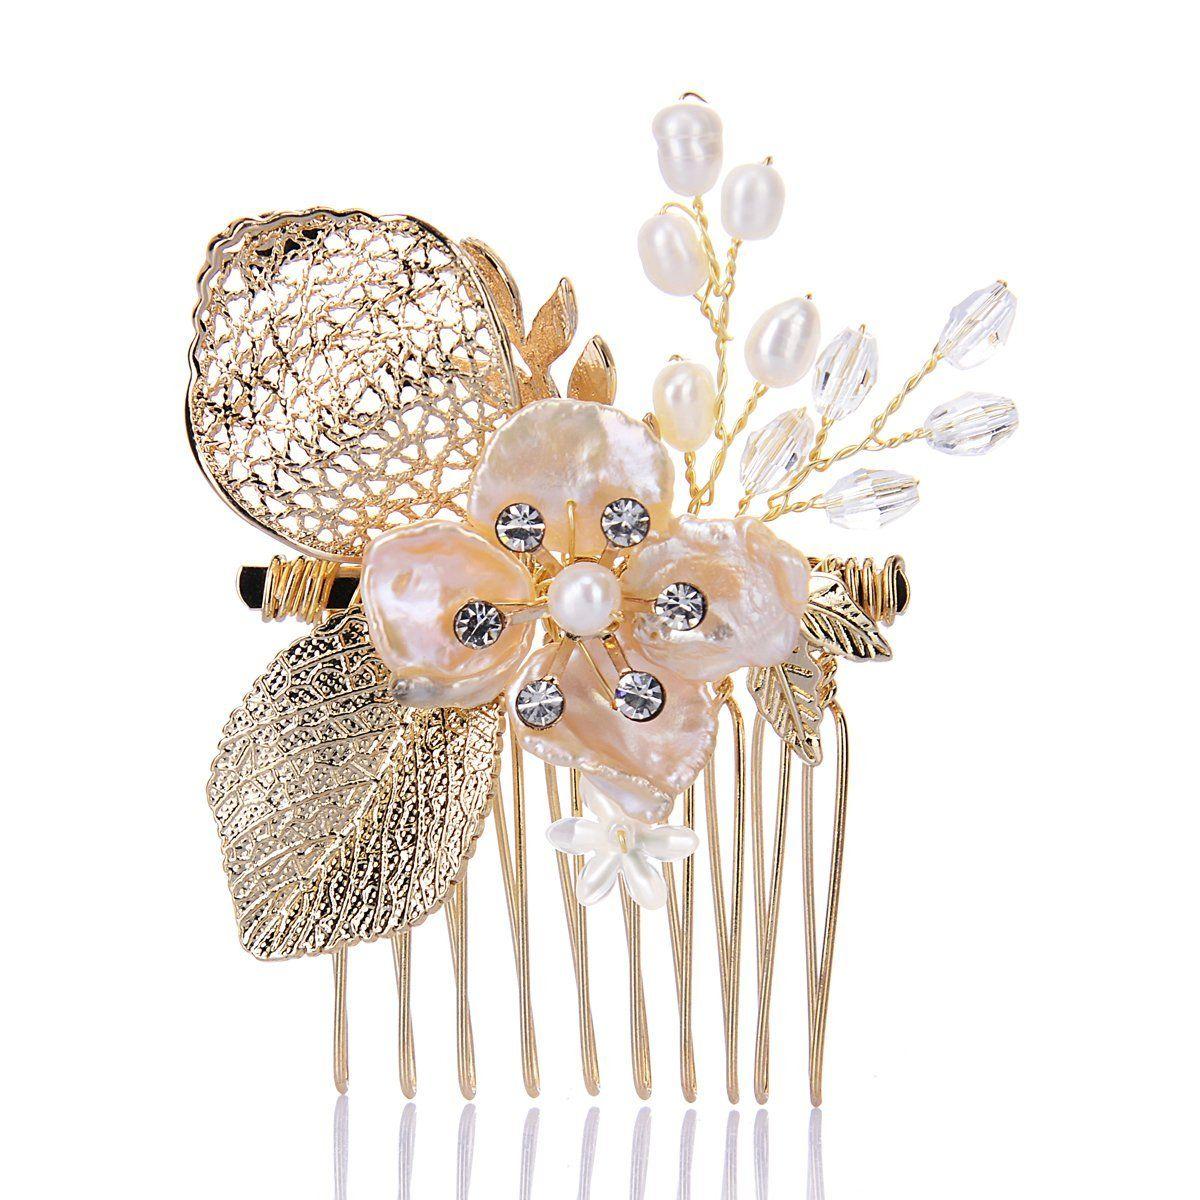 remedios handmade rose gold pearl hair comb wedding hair accessory